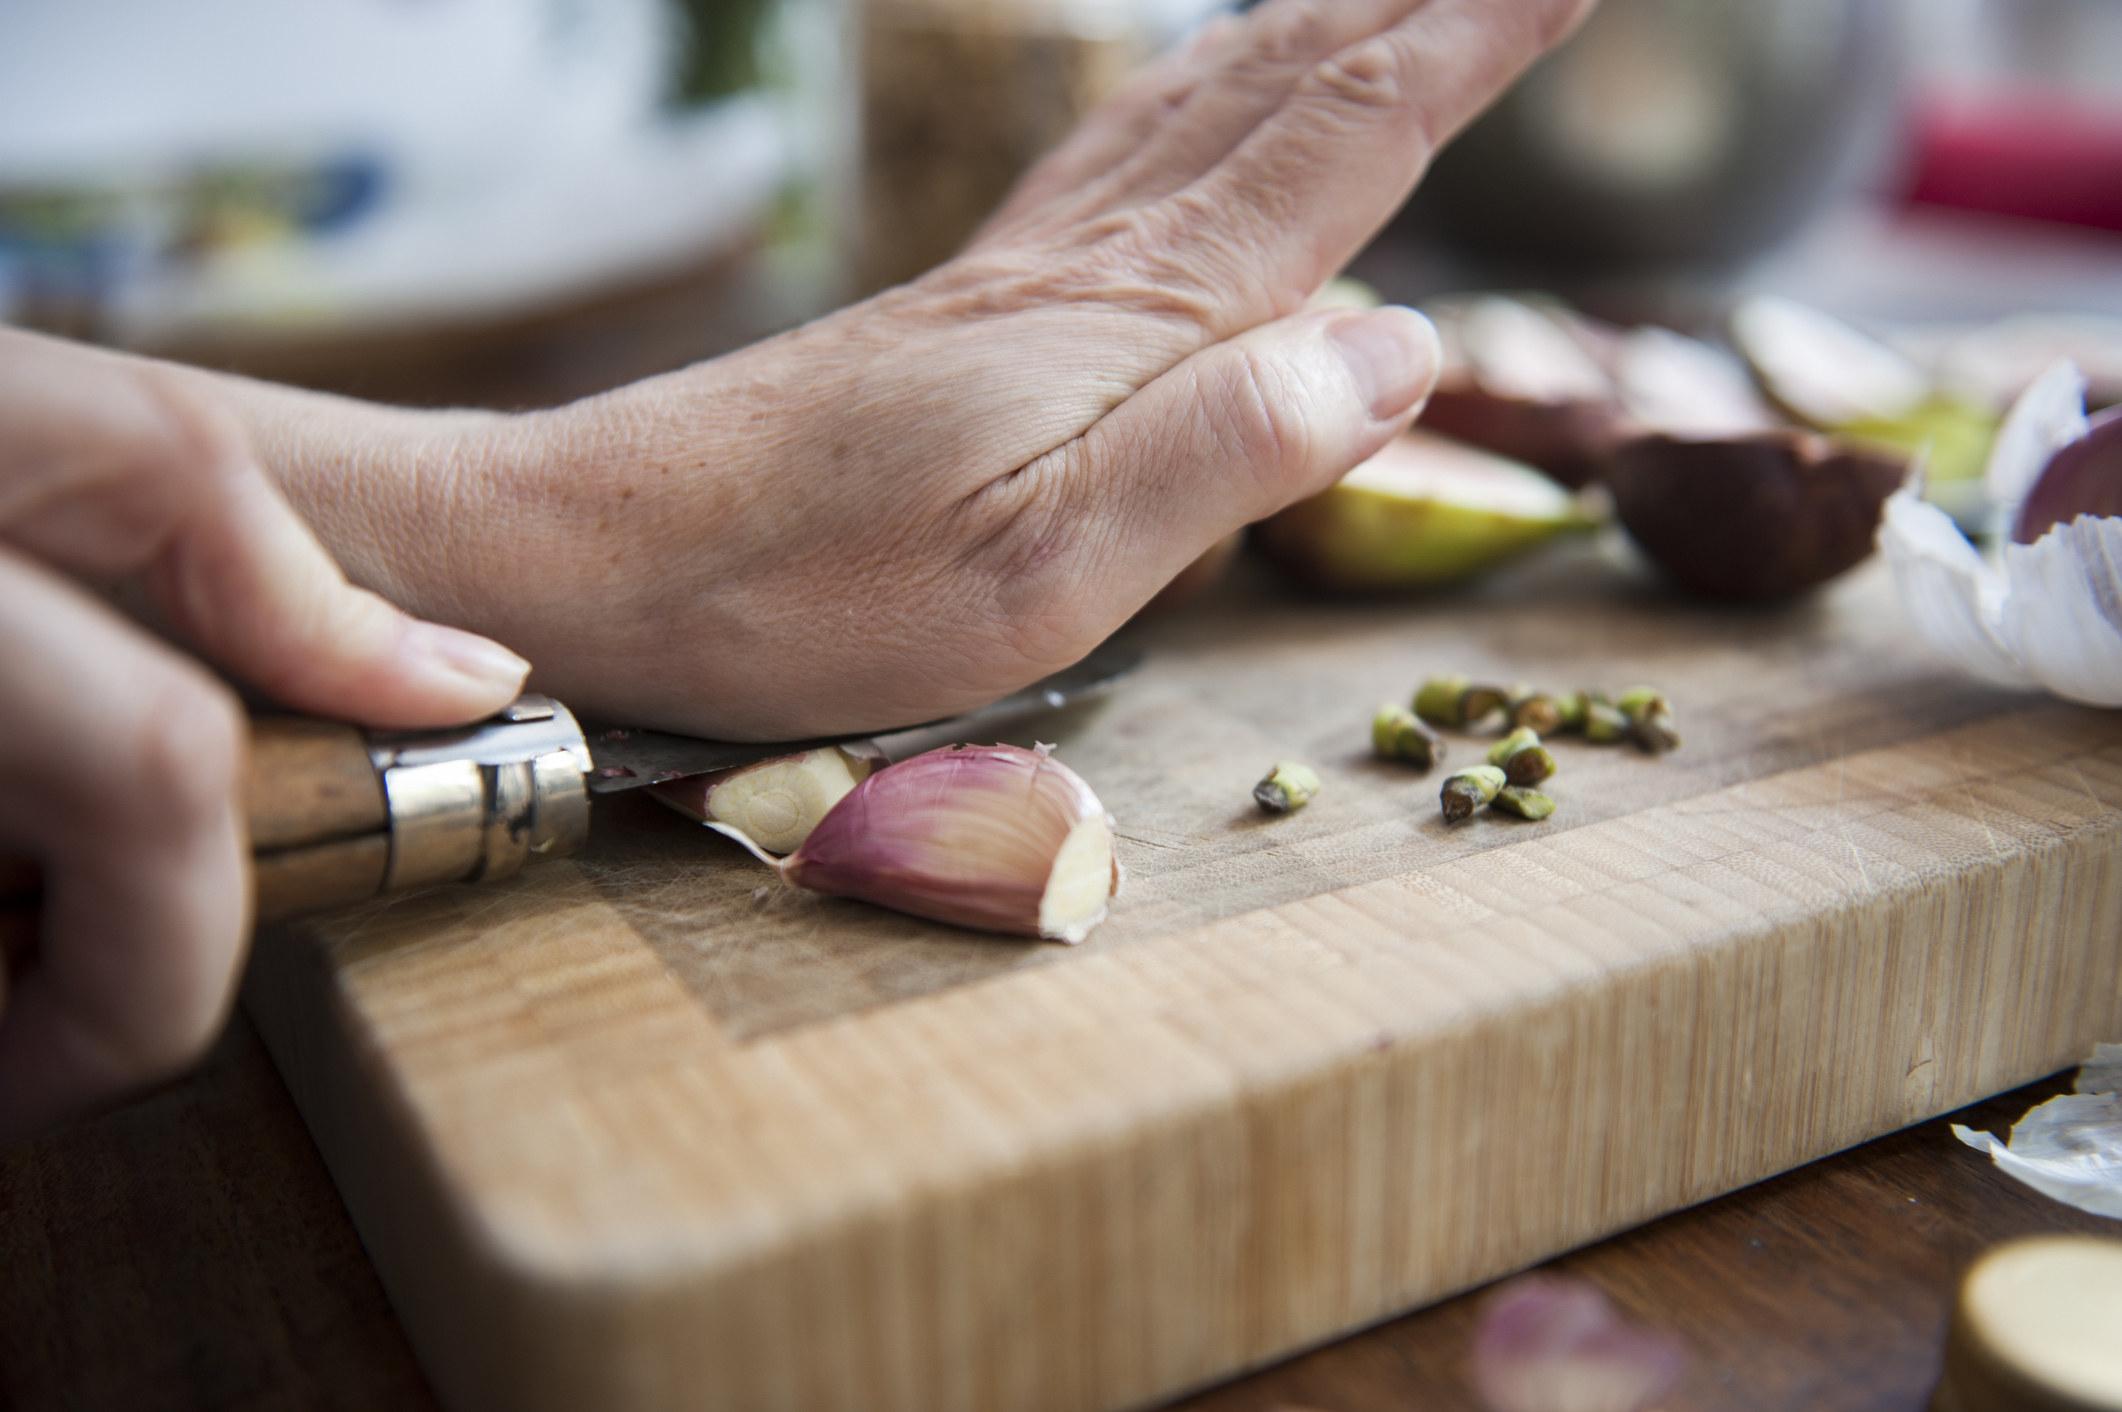 Peeling garlic on a cutting board.